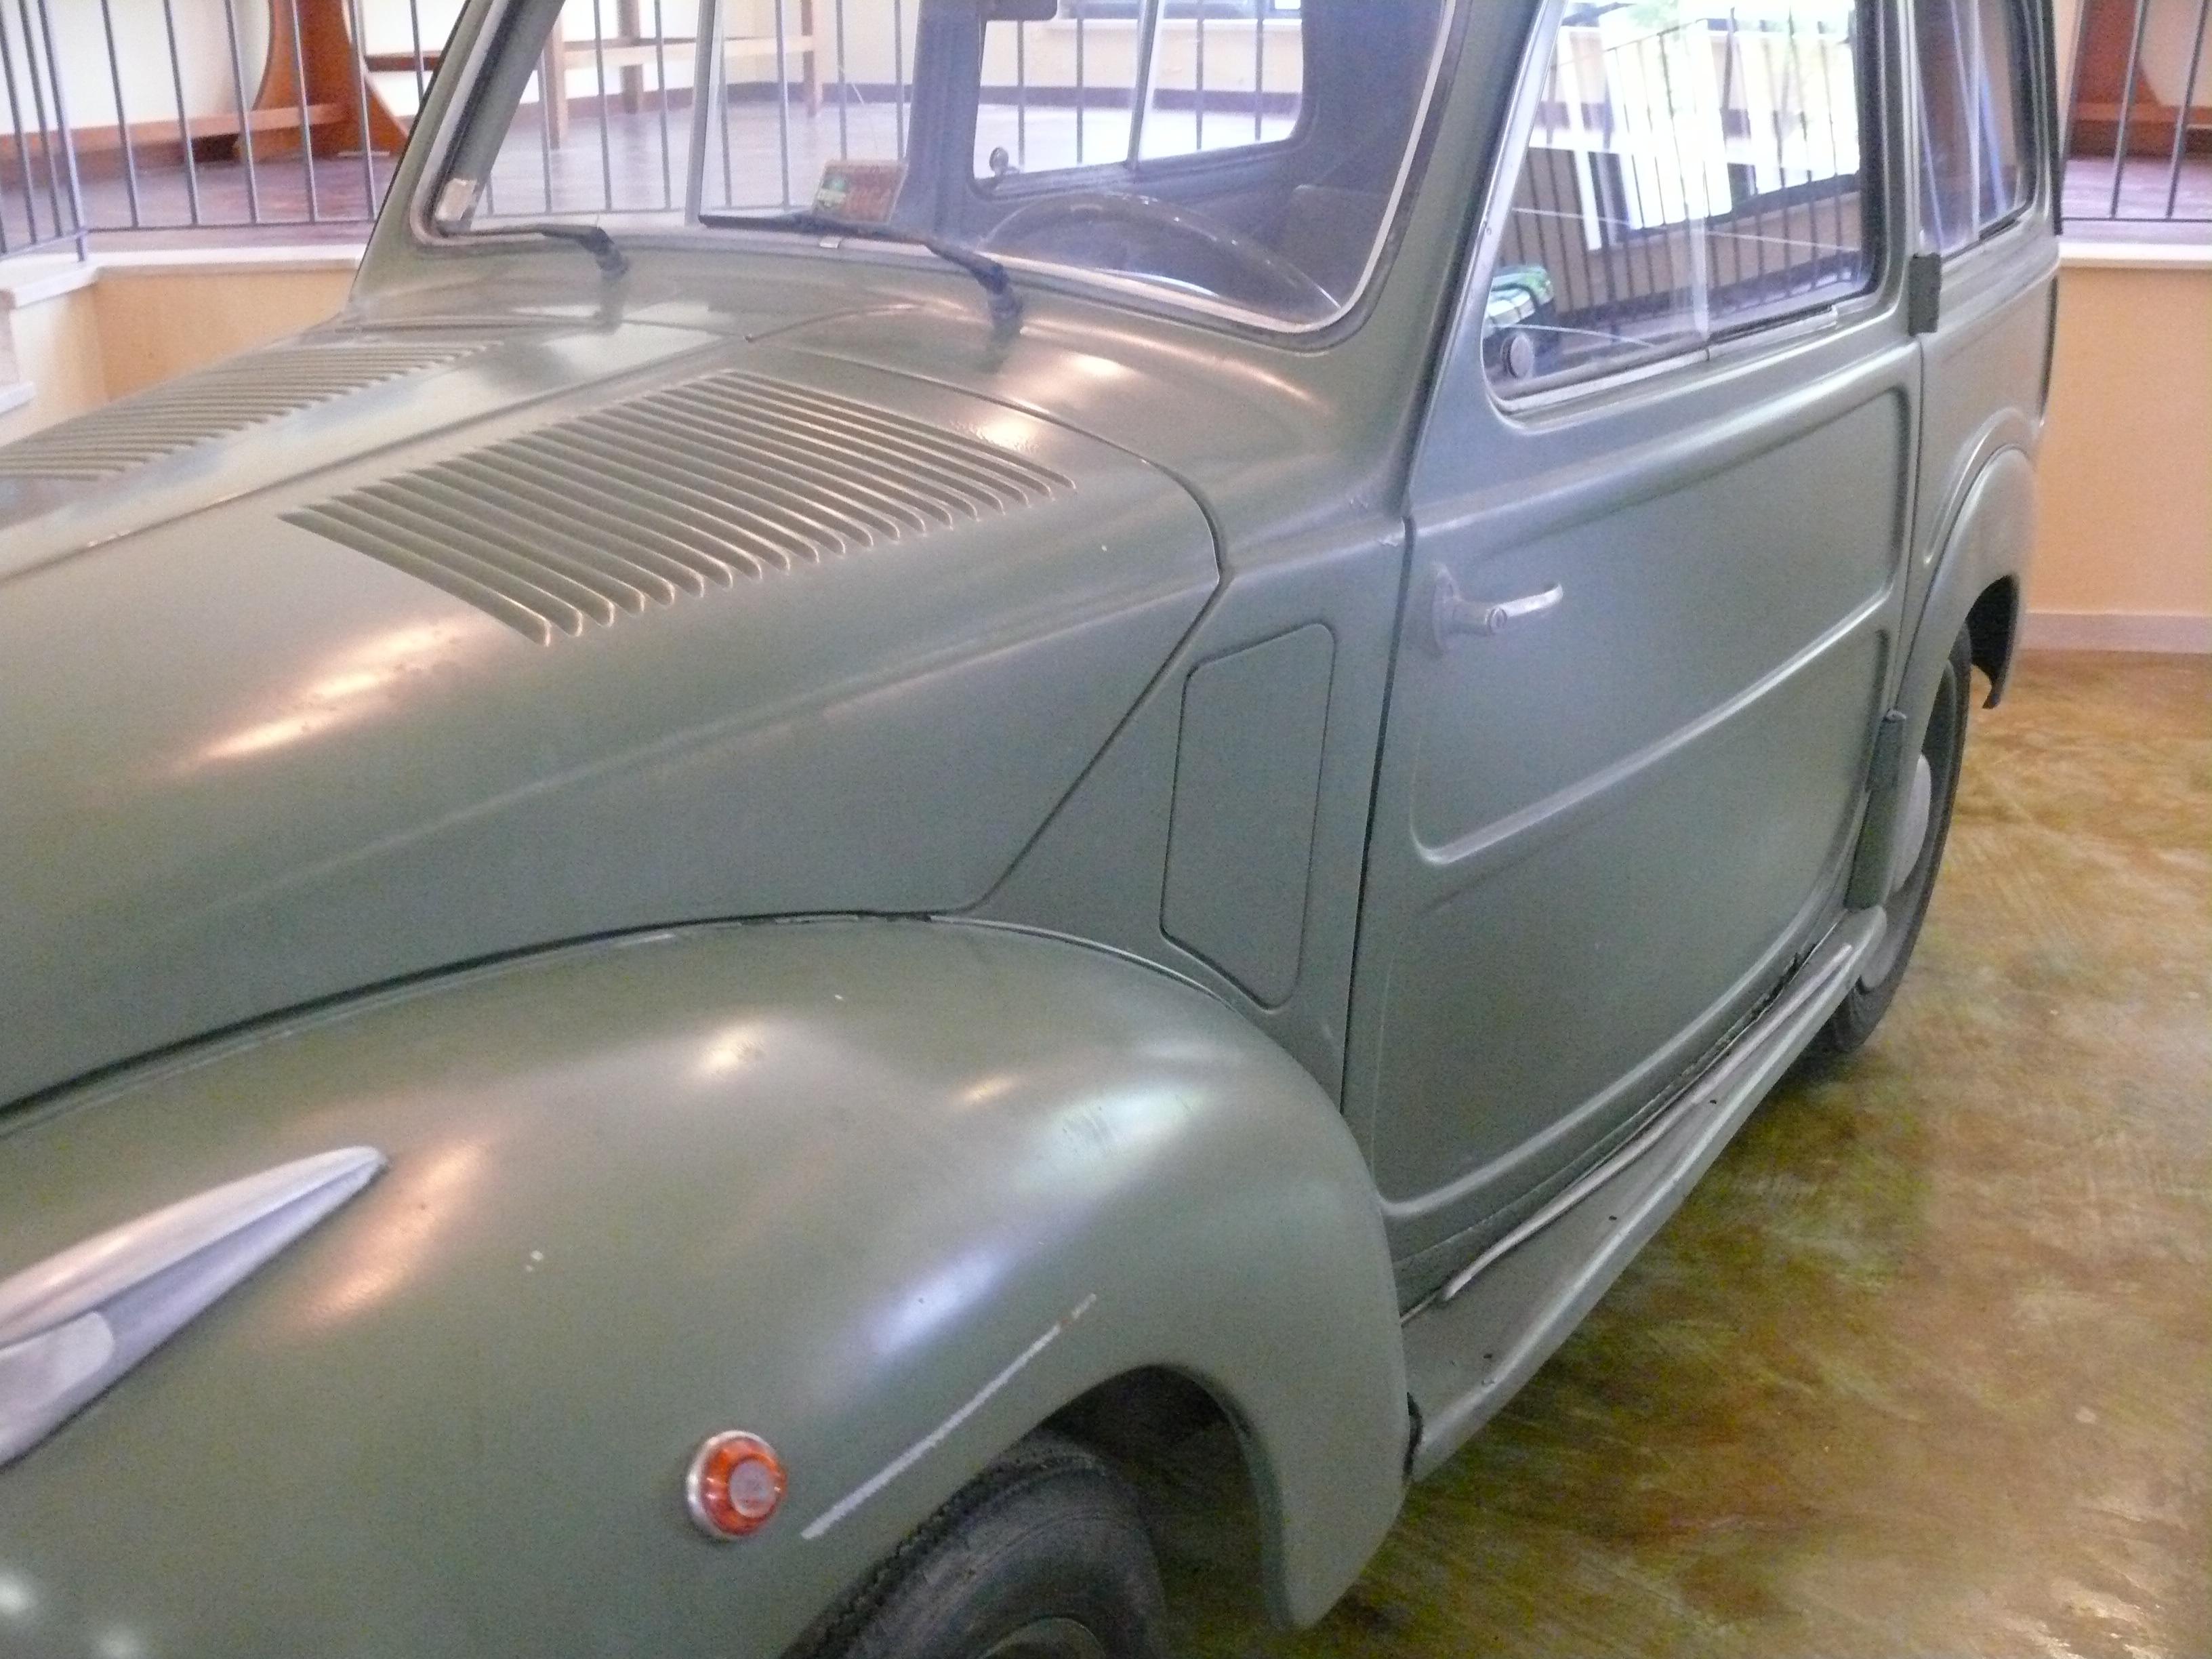 Fiat 500 B Belvedere 1951 Rome Maquetland Com Le Monde